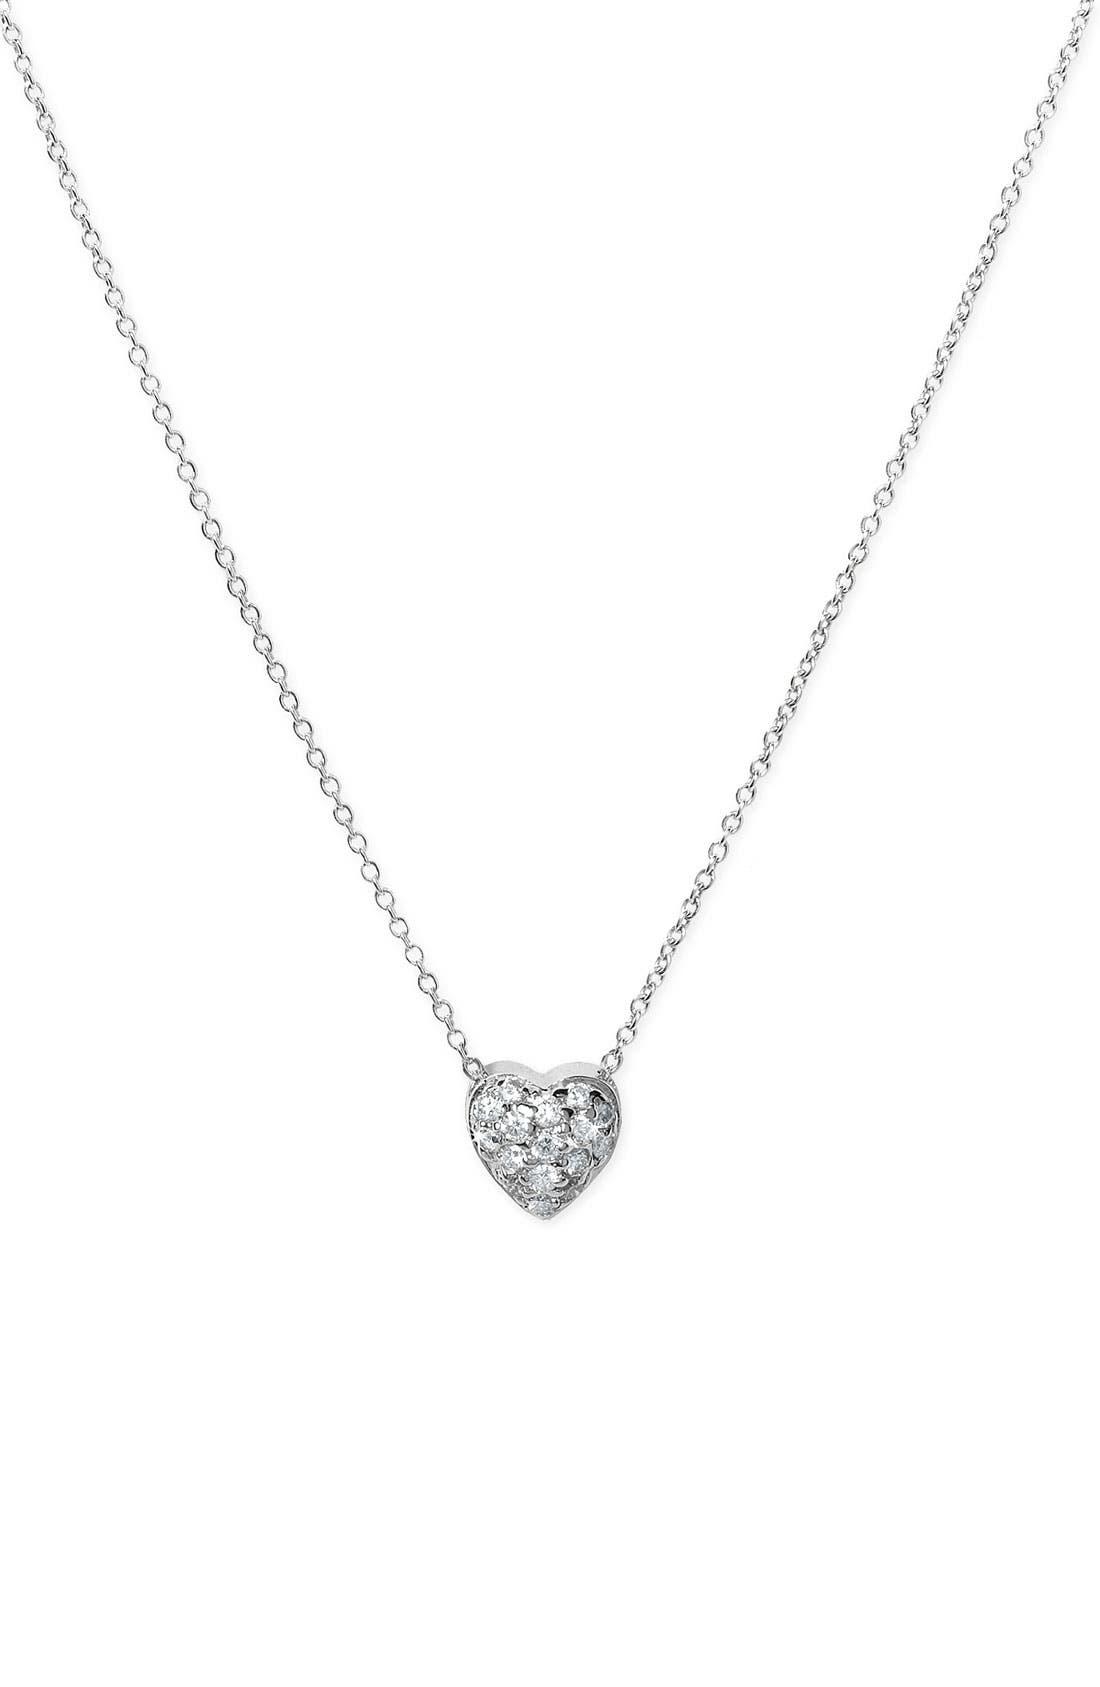 'Tiny Treasures' Diamond Puffed Heart Pendant Necklace,                         Main,                         color, Puffed Heart